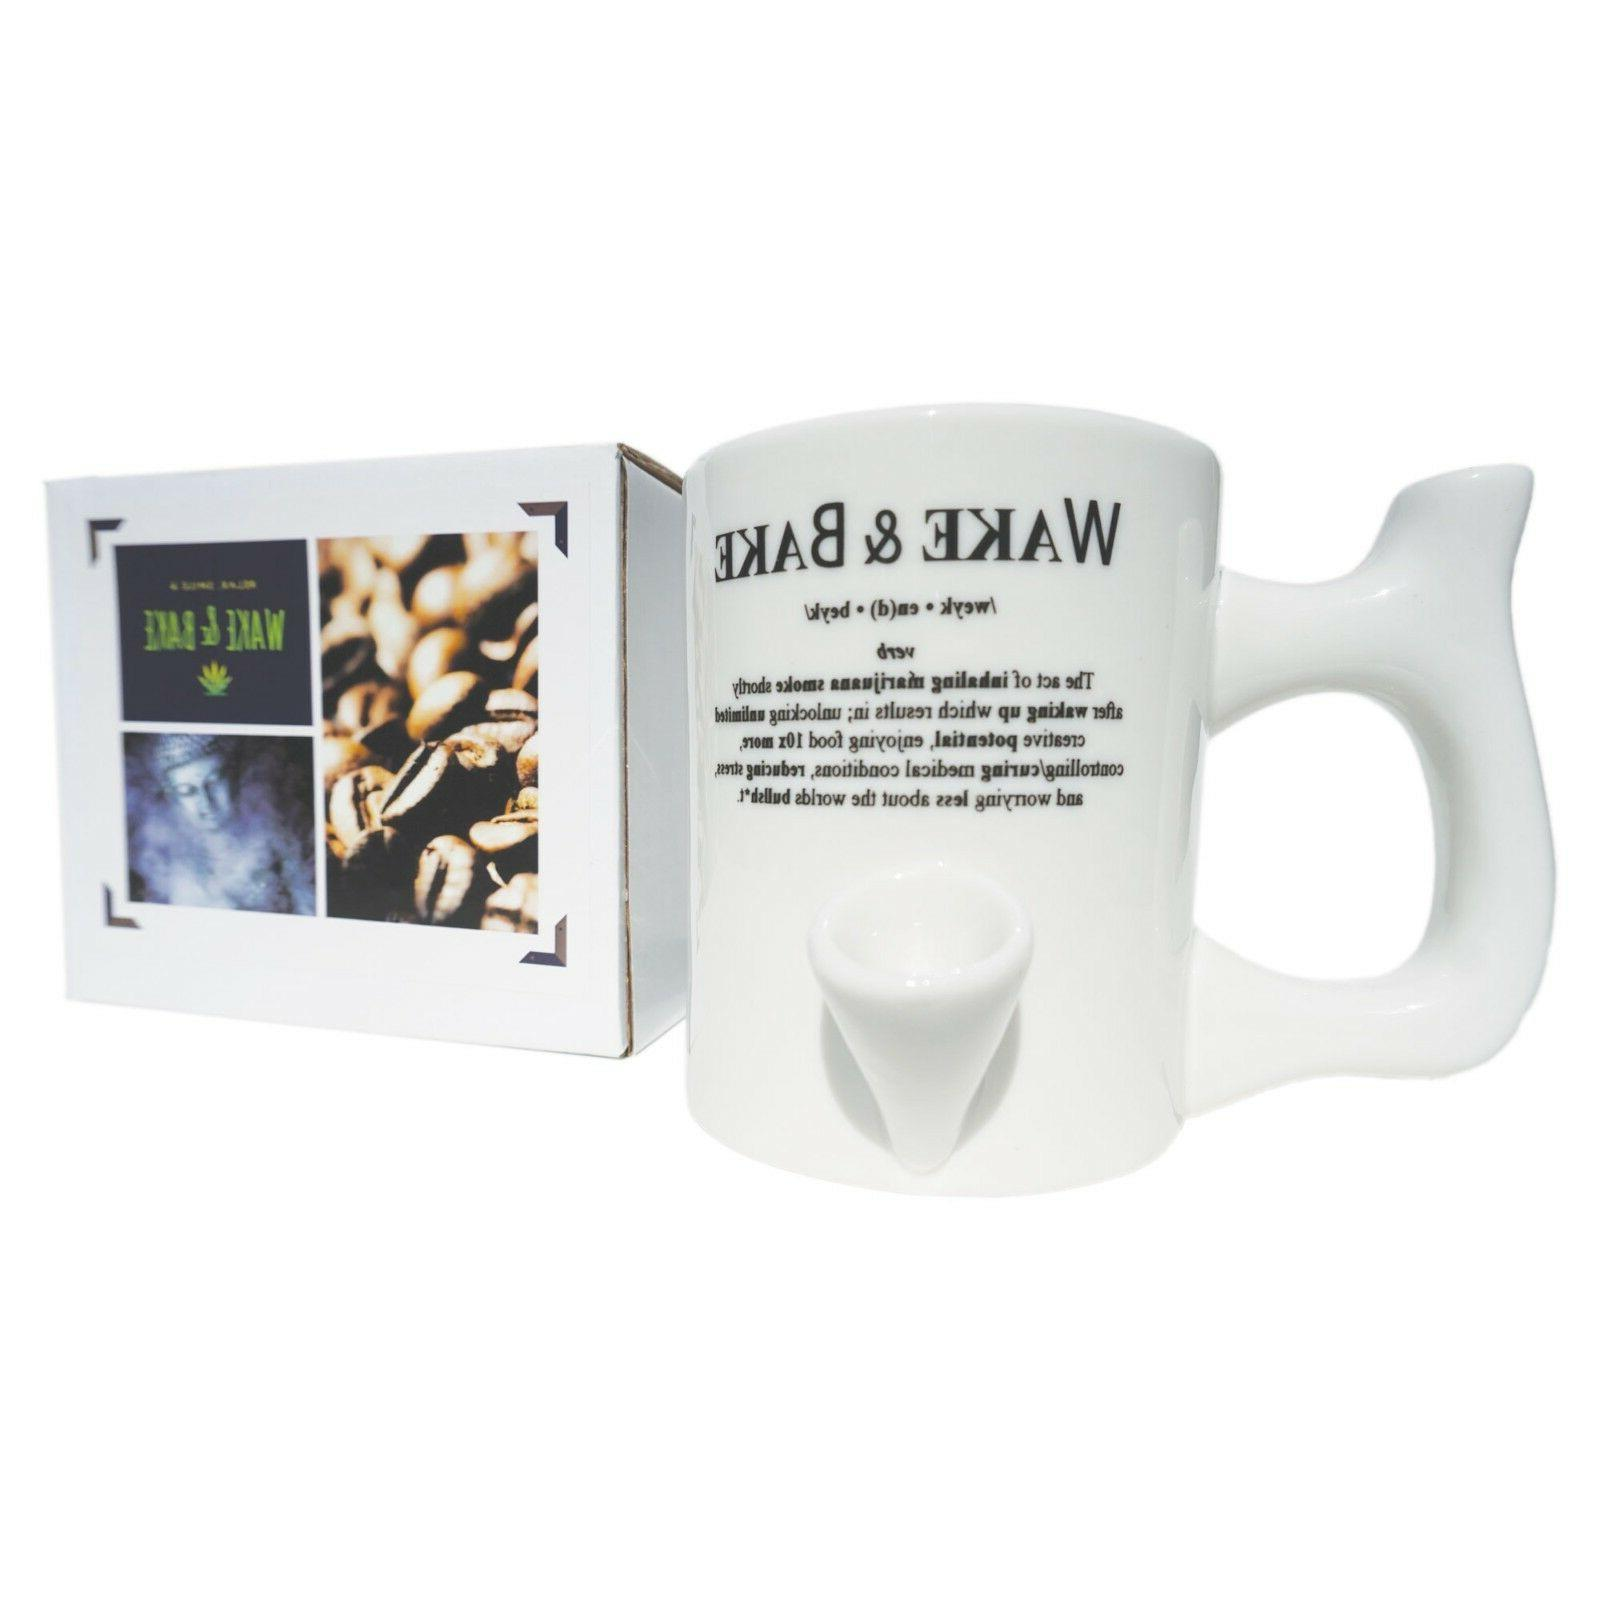 Wake and Bake Coffee Mug Smoking Pipe Solid Ceramic Cup